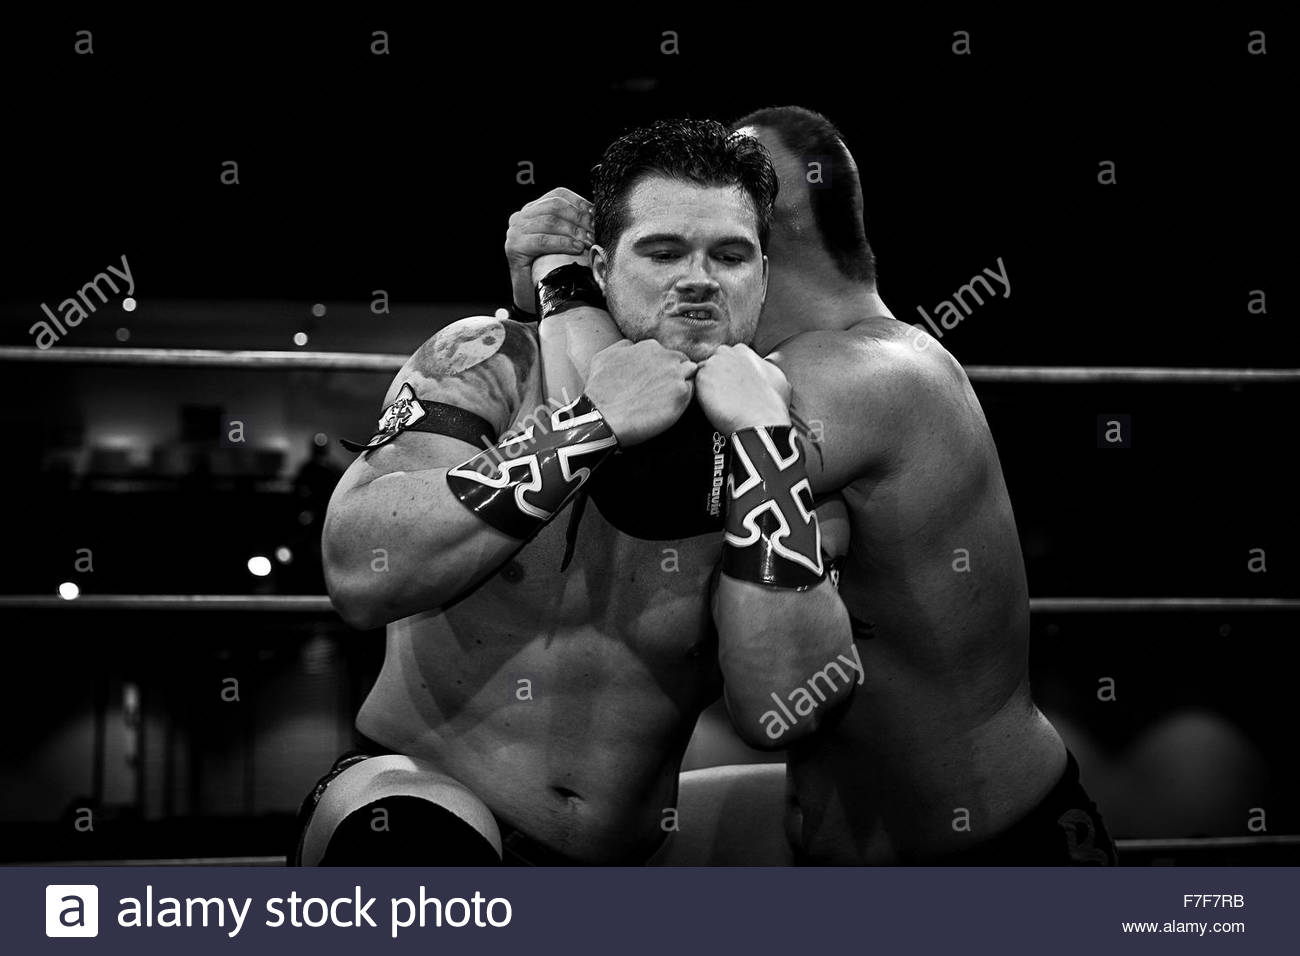 Wrestling Imagen De Stock